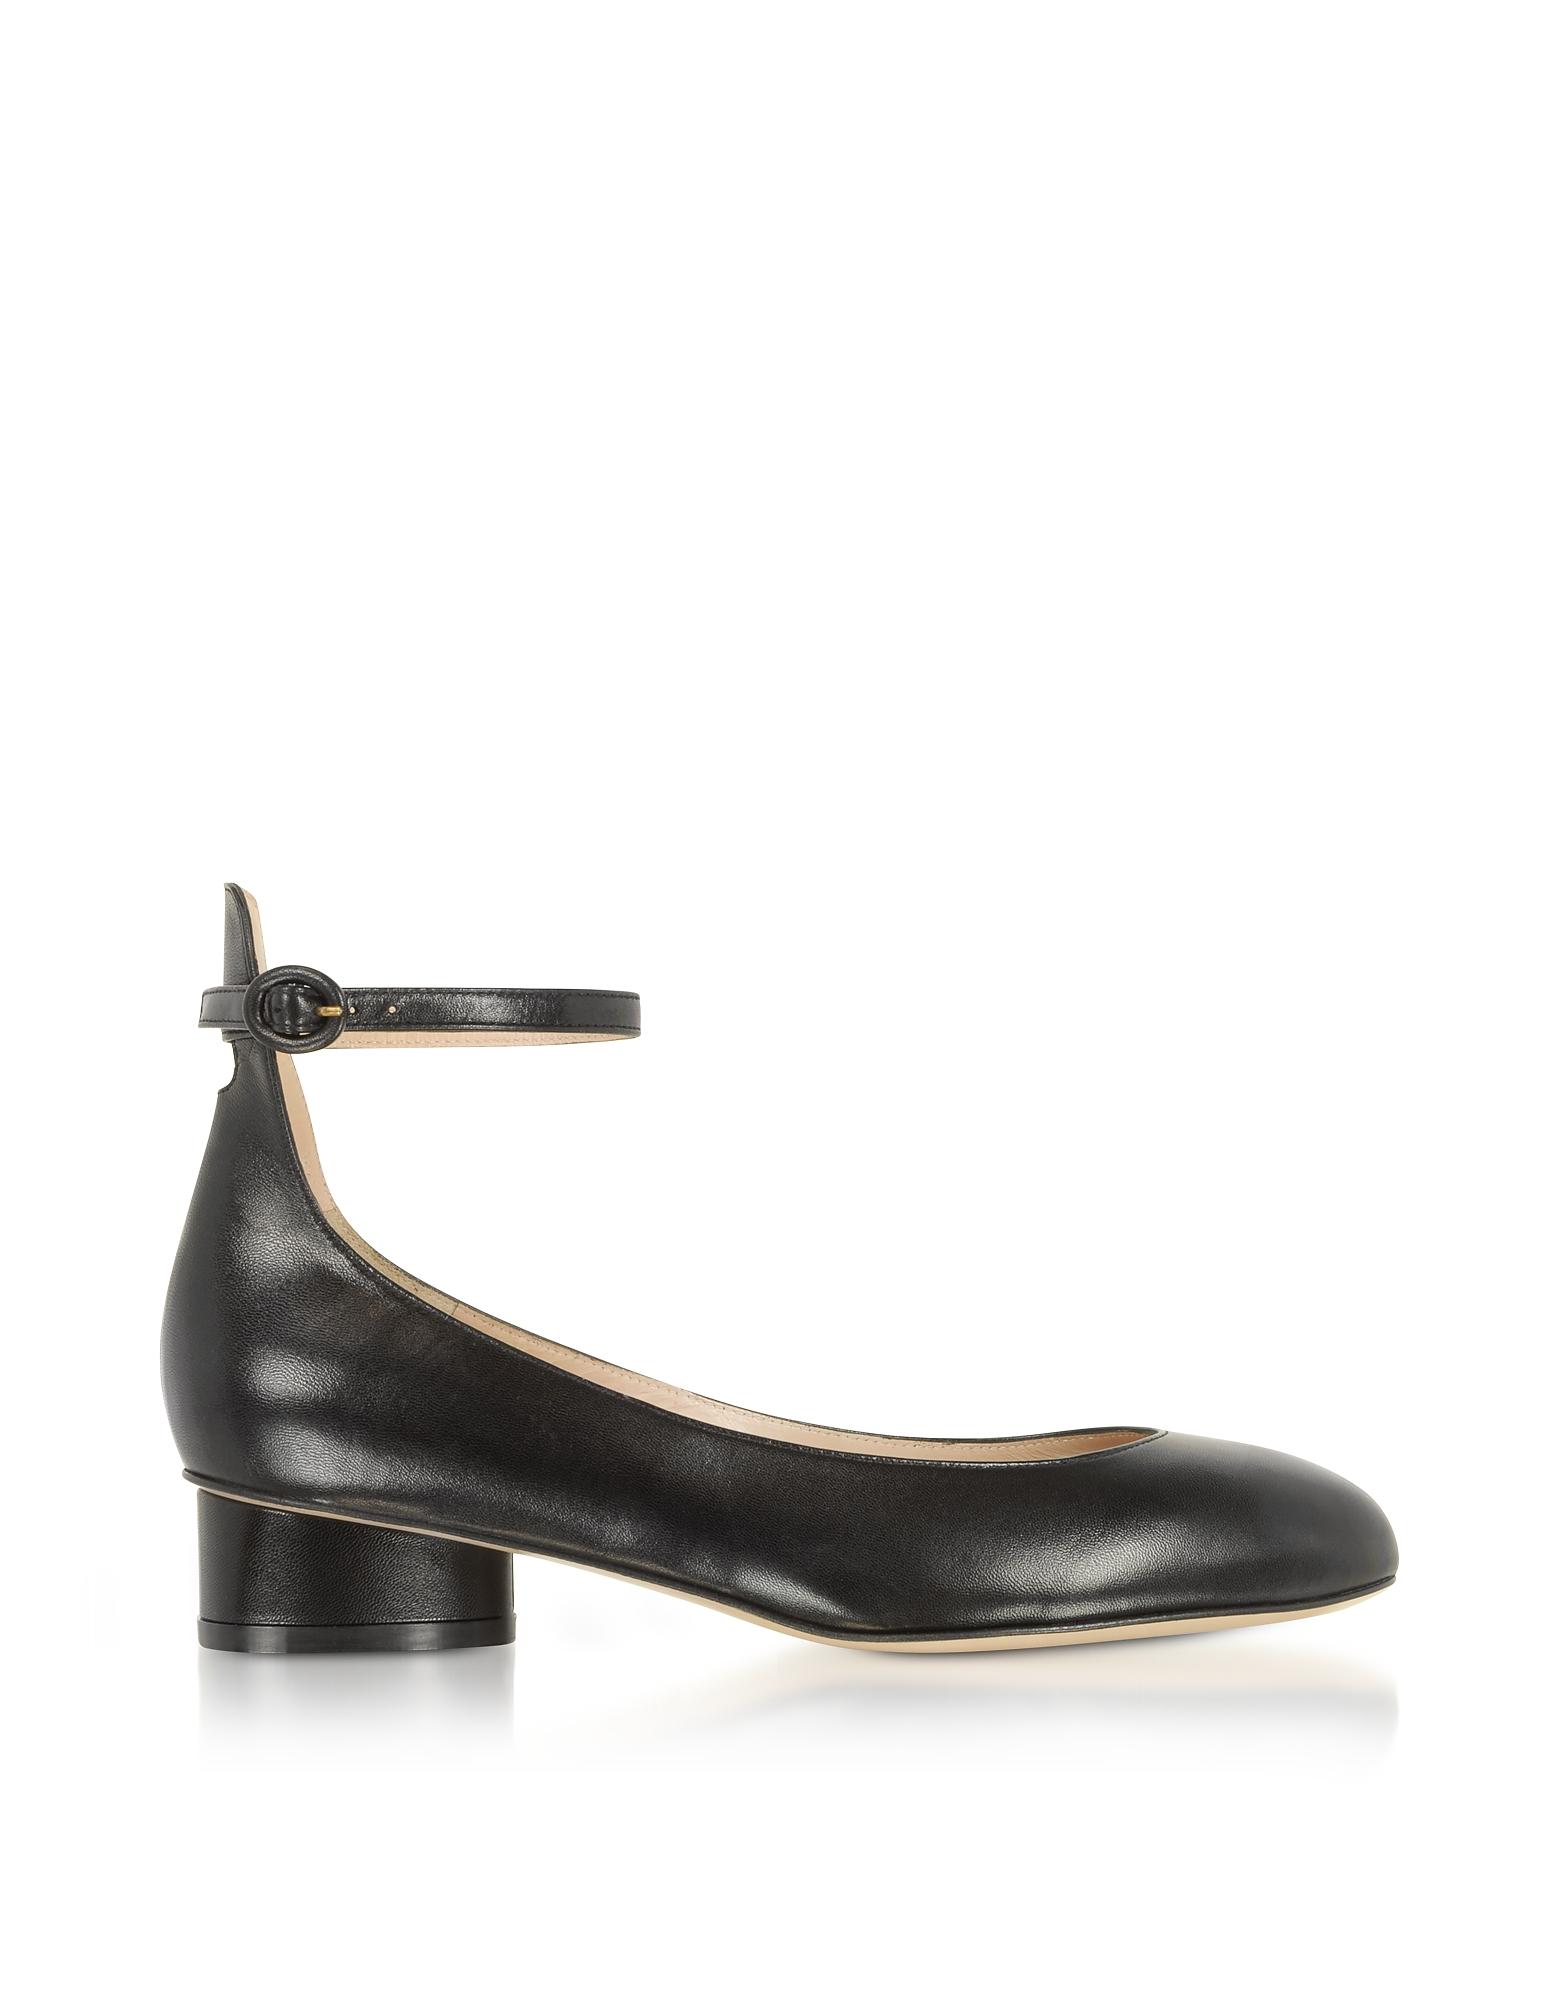 Polly Black Leather Mid-Heel Pump